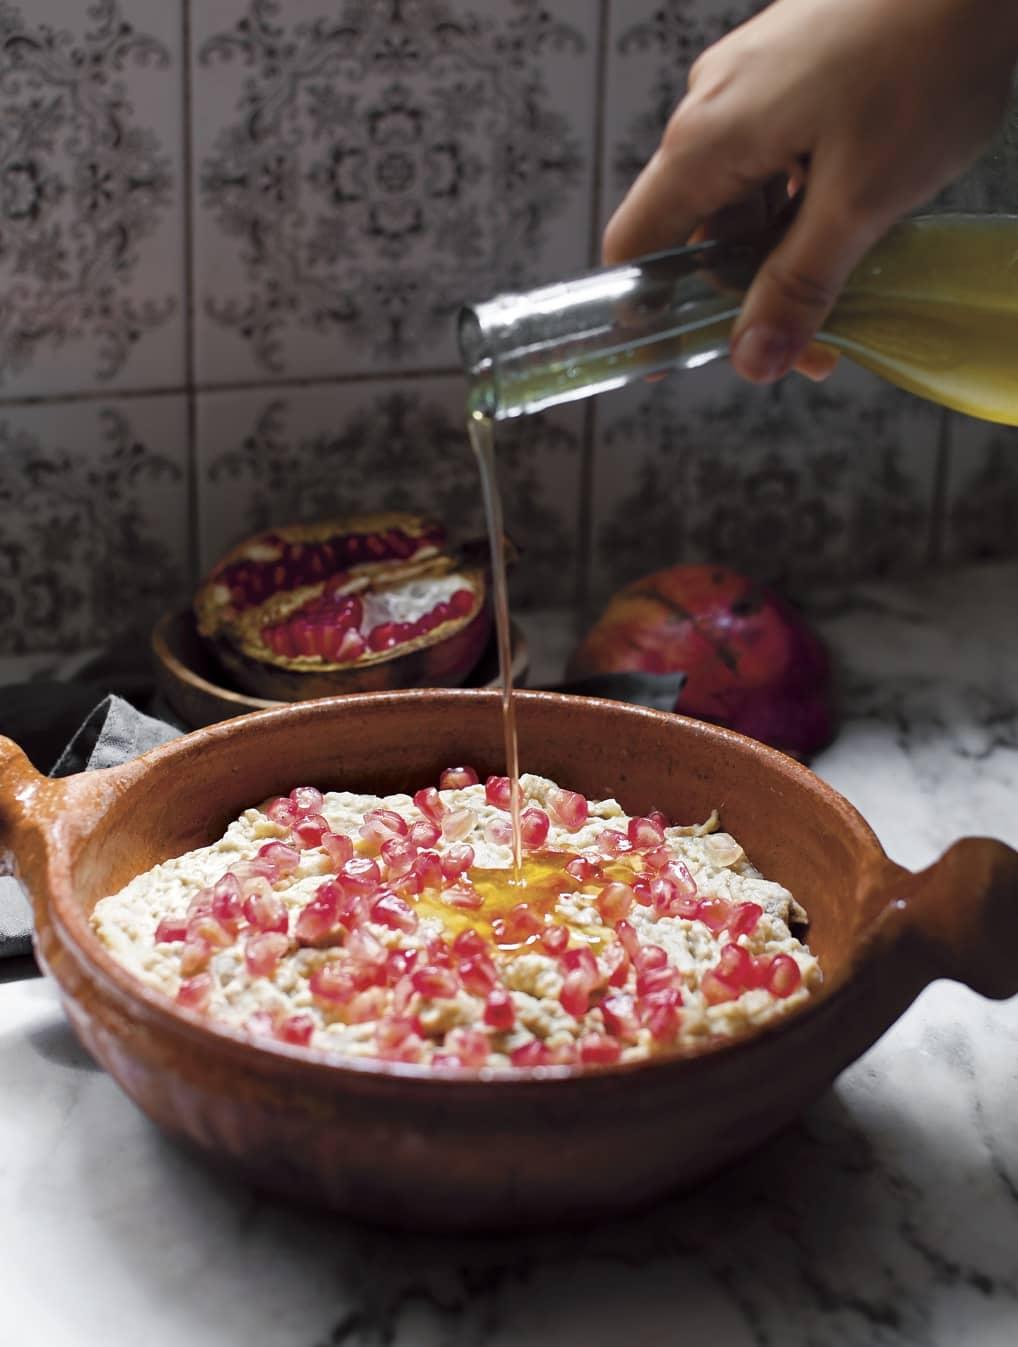 Recette du caviar d'aubergines de Tara Khatta